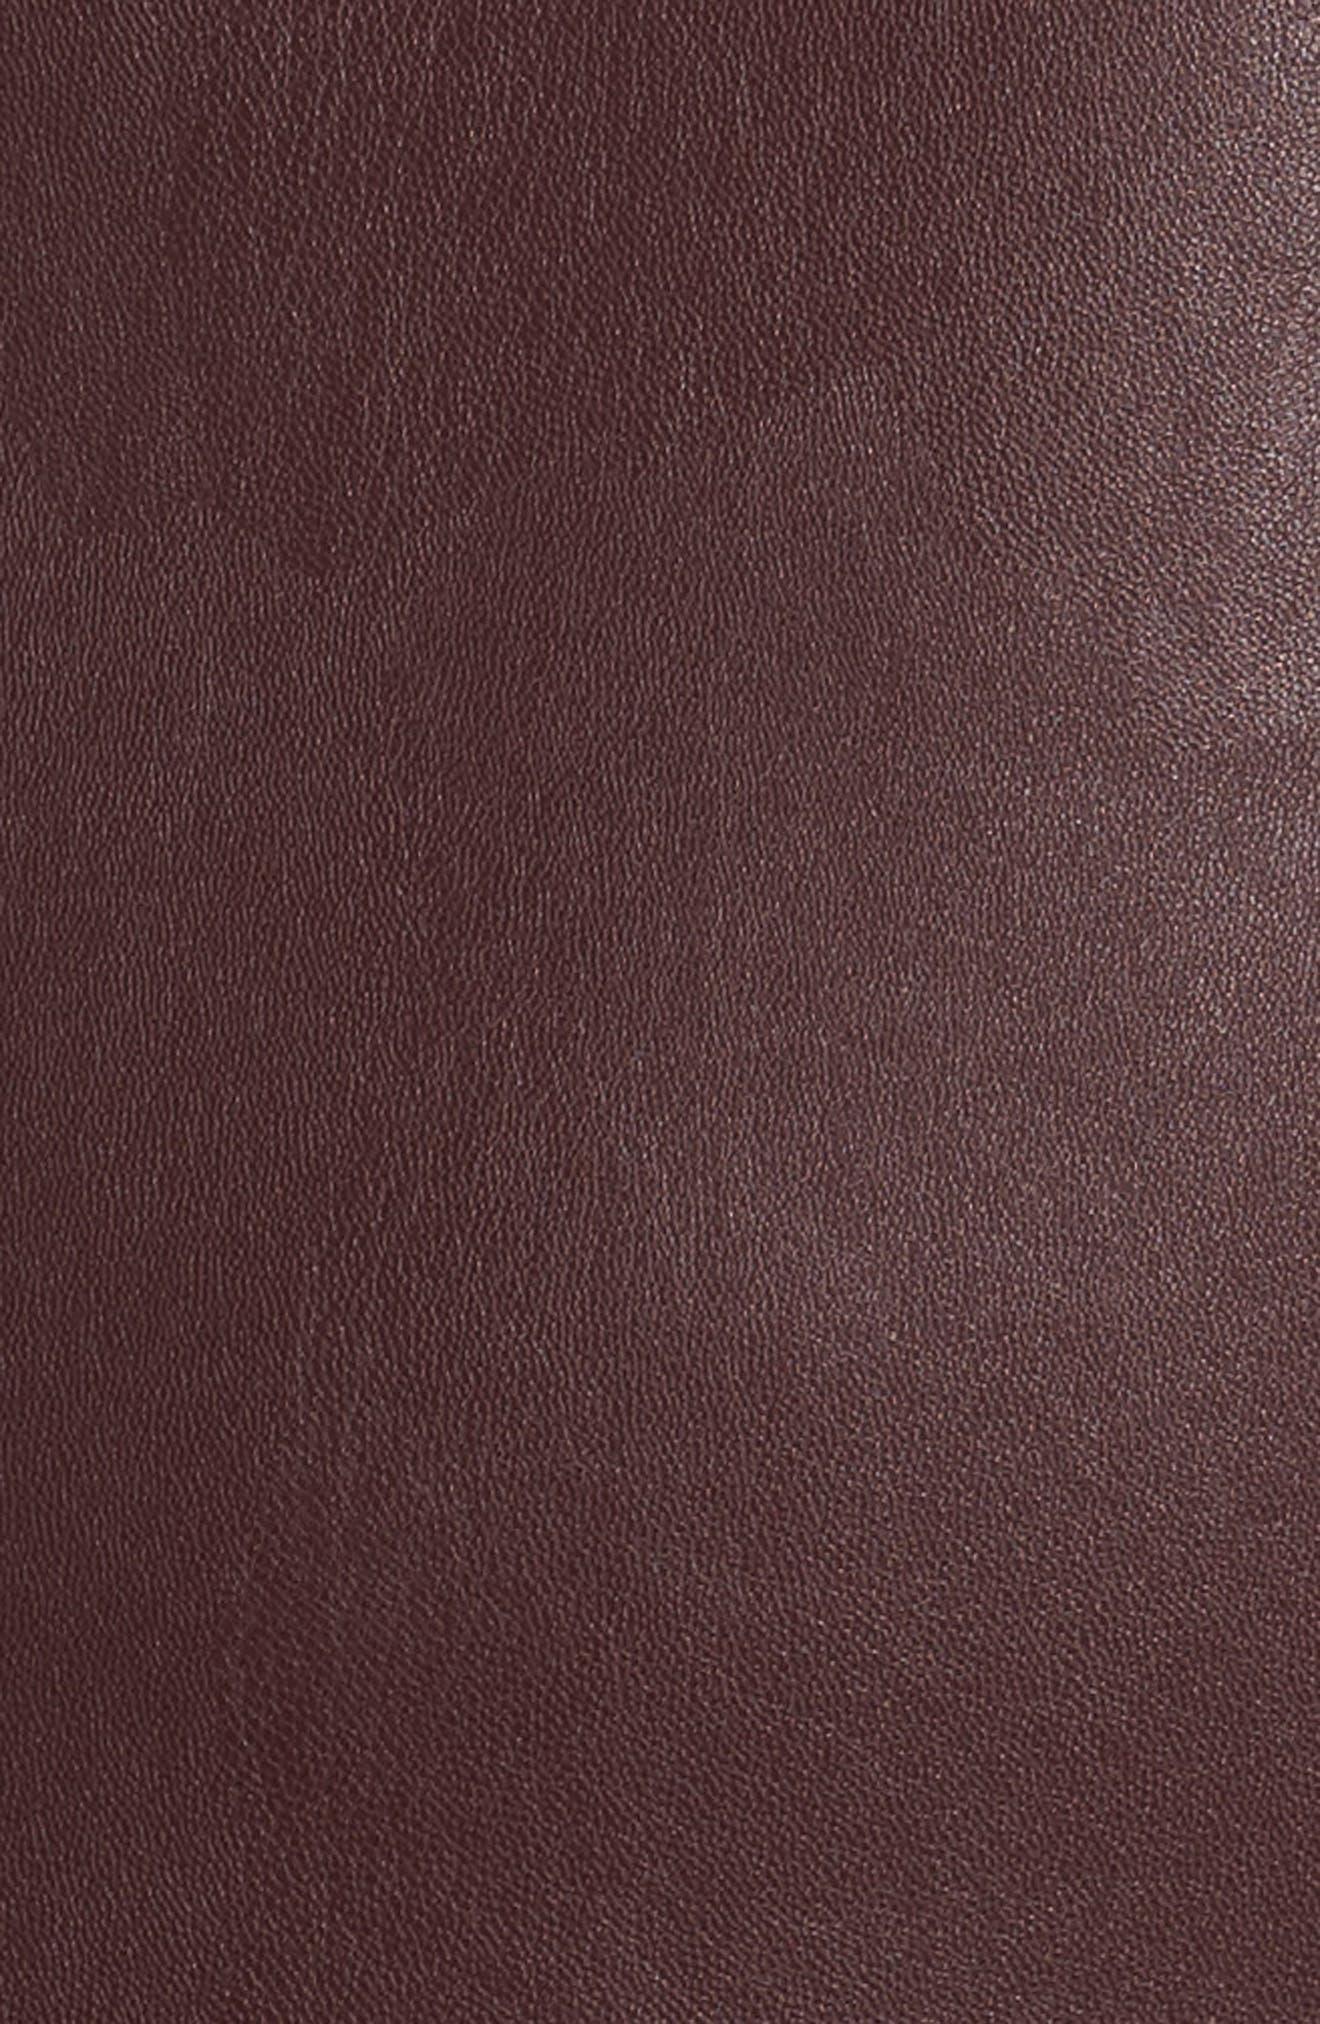 Alternate Image 5  - Persona by Marina Rinaldi Narrare Faux Leather Coat (Plus Size)